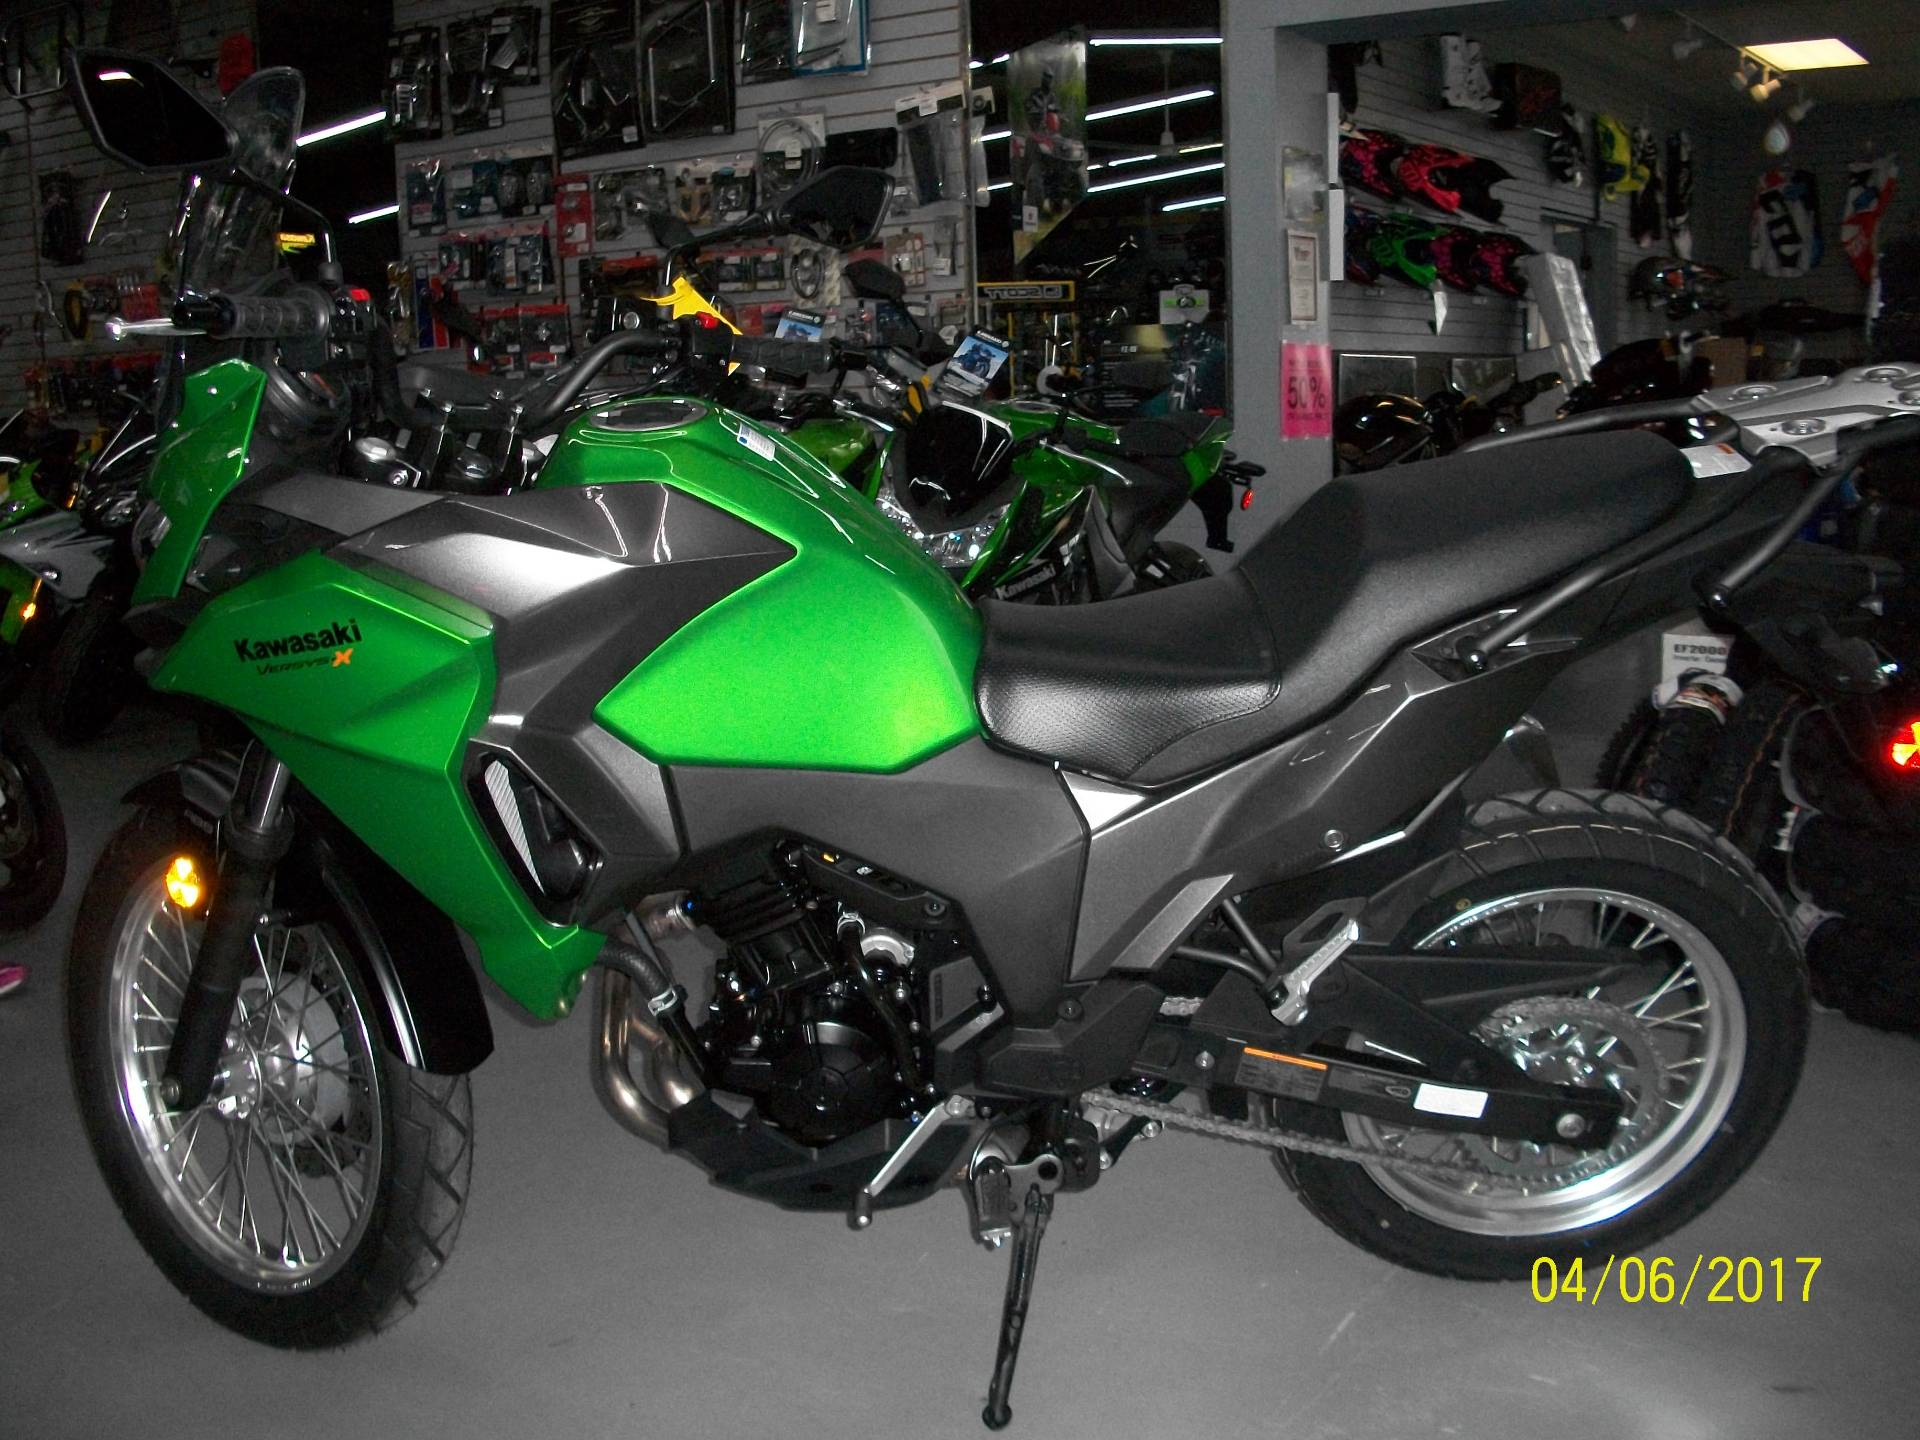 2017 Kawasaki Versys-X 300 in New Castle, Pennsylvania